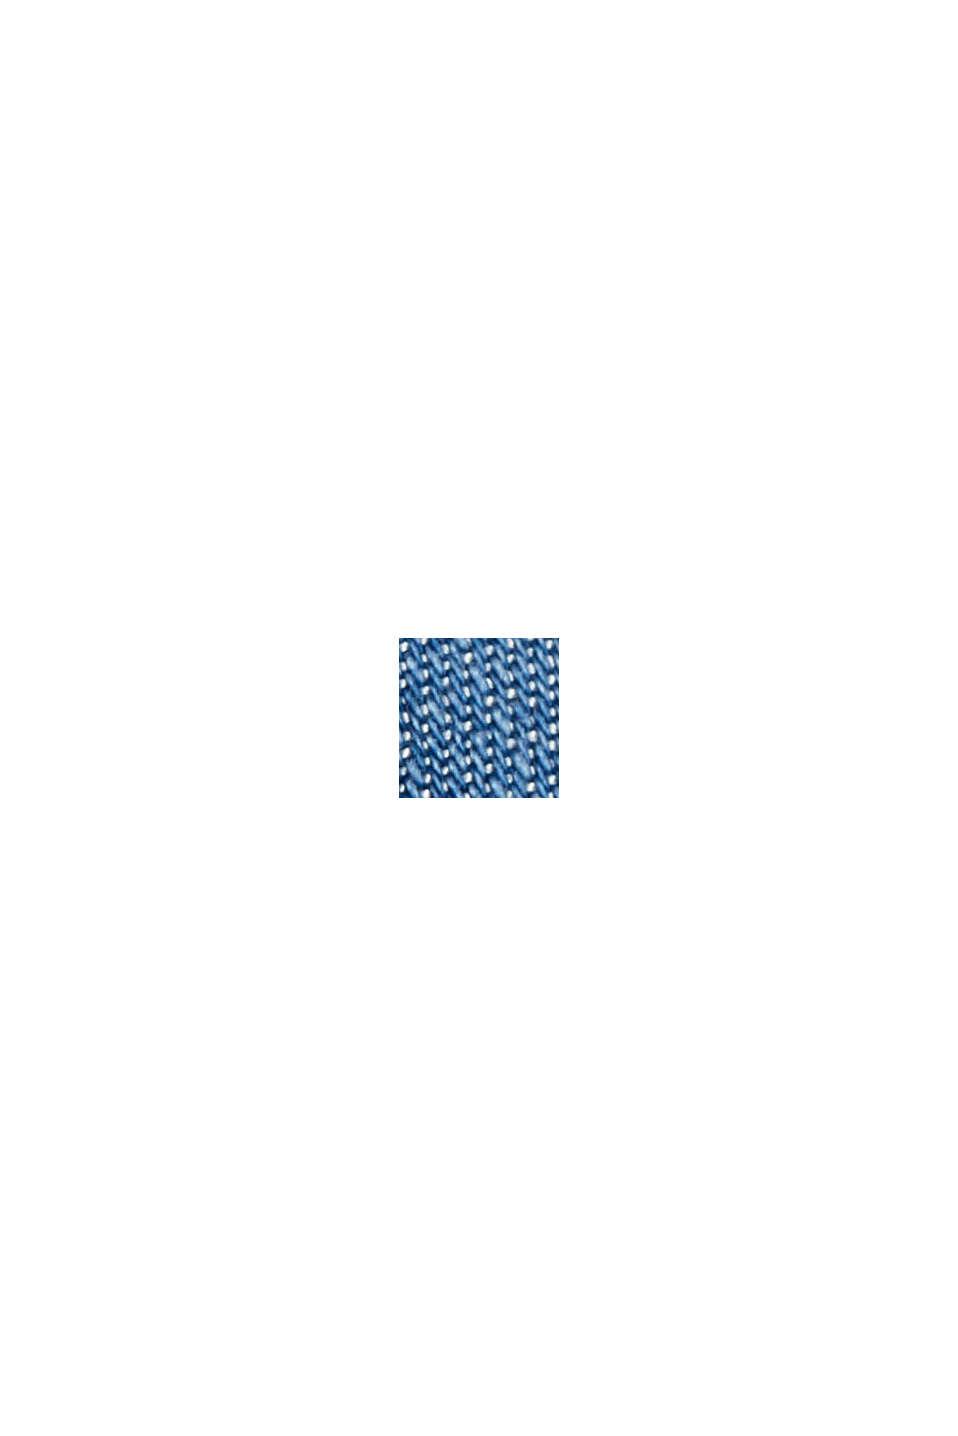 Van TENCEL™ lyocell: denim blouse, BLUE MEDIUM WASHED, swatch